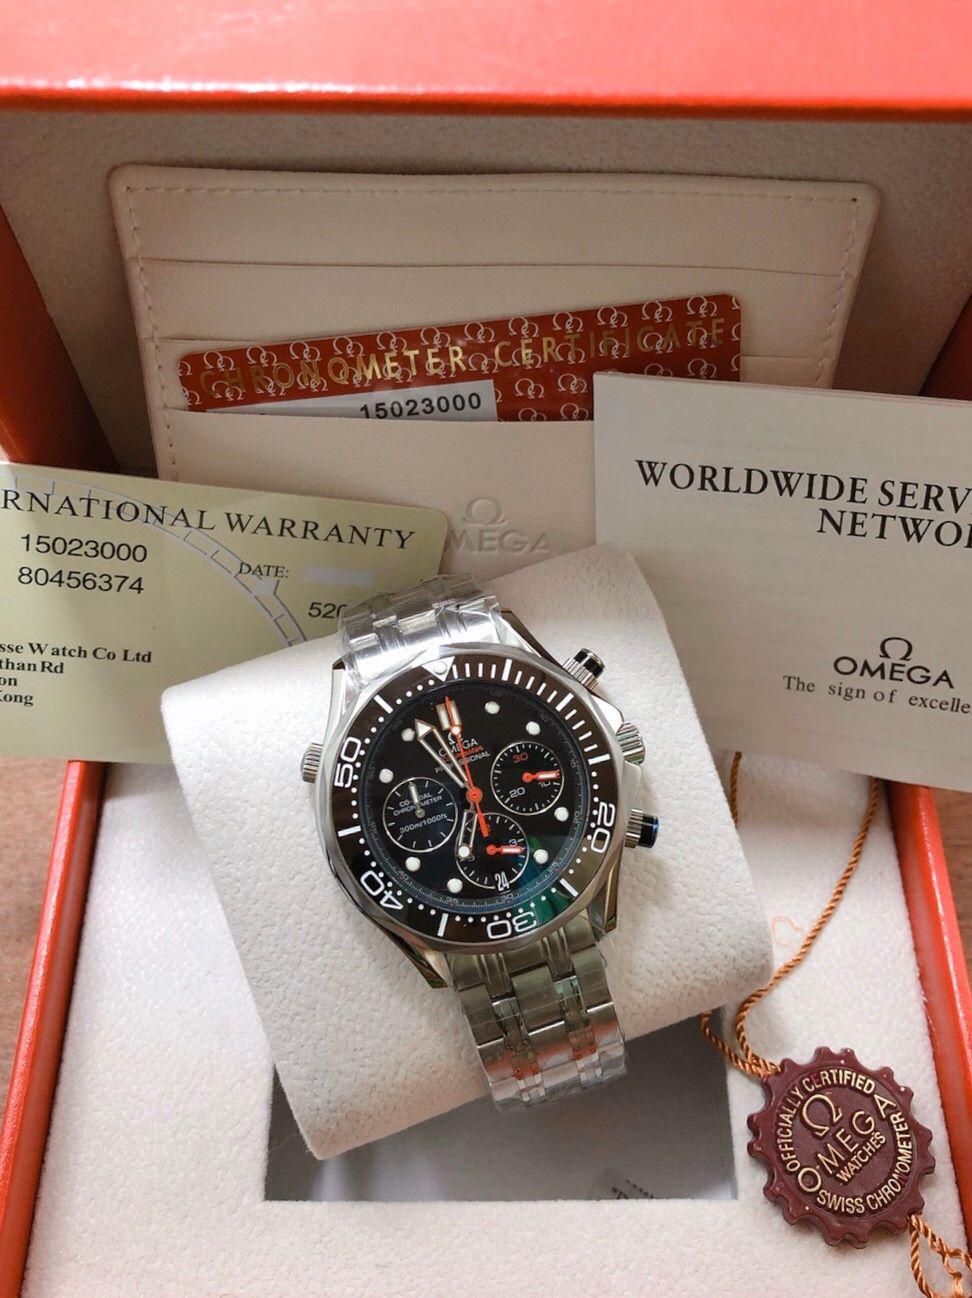 Omega Seamaster Diver 300m Chronograph ETNZ Limited Edition Black Dial